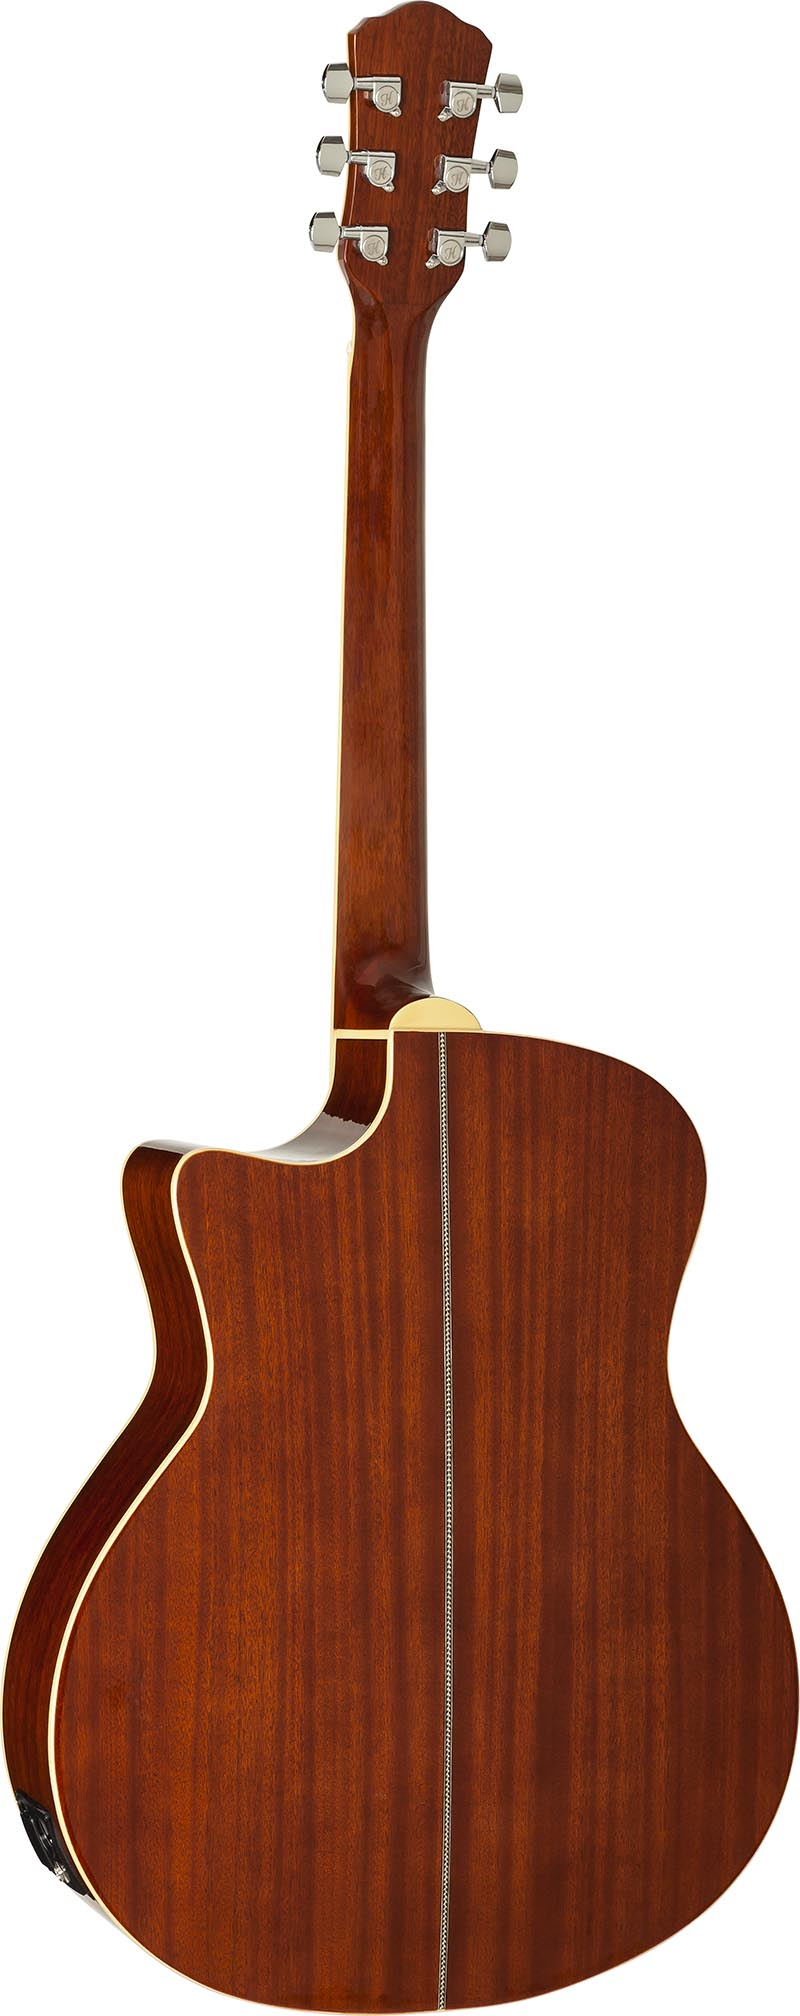 hma260 violao folk auditorium hofma hma260 sb sunburst visao posterior vertical